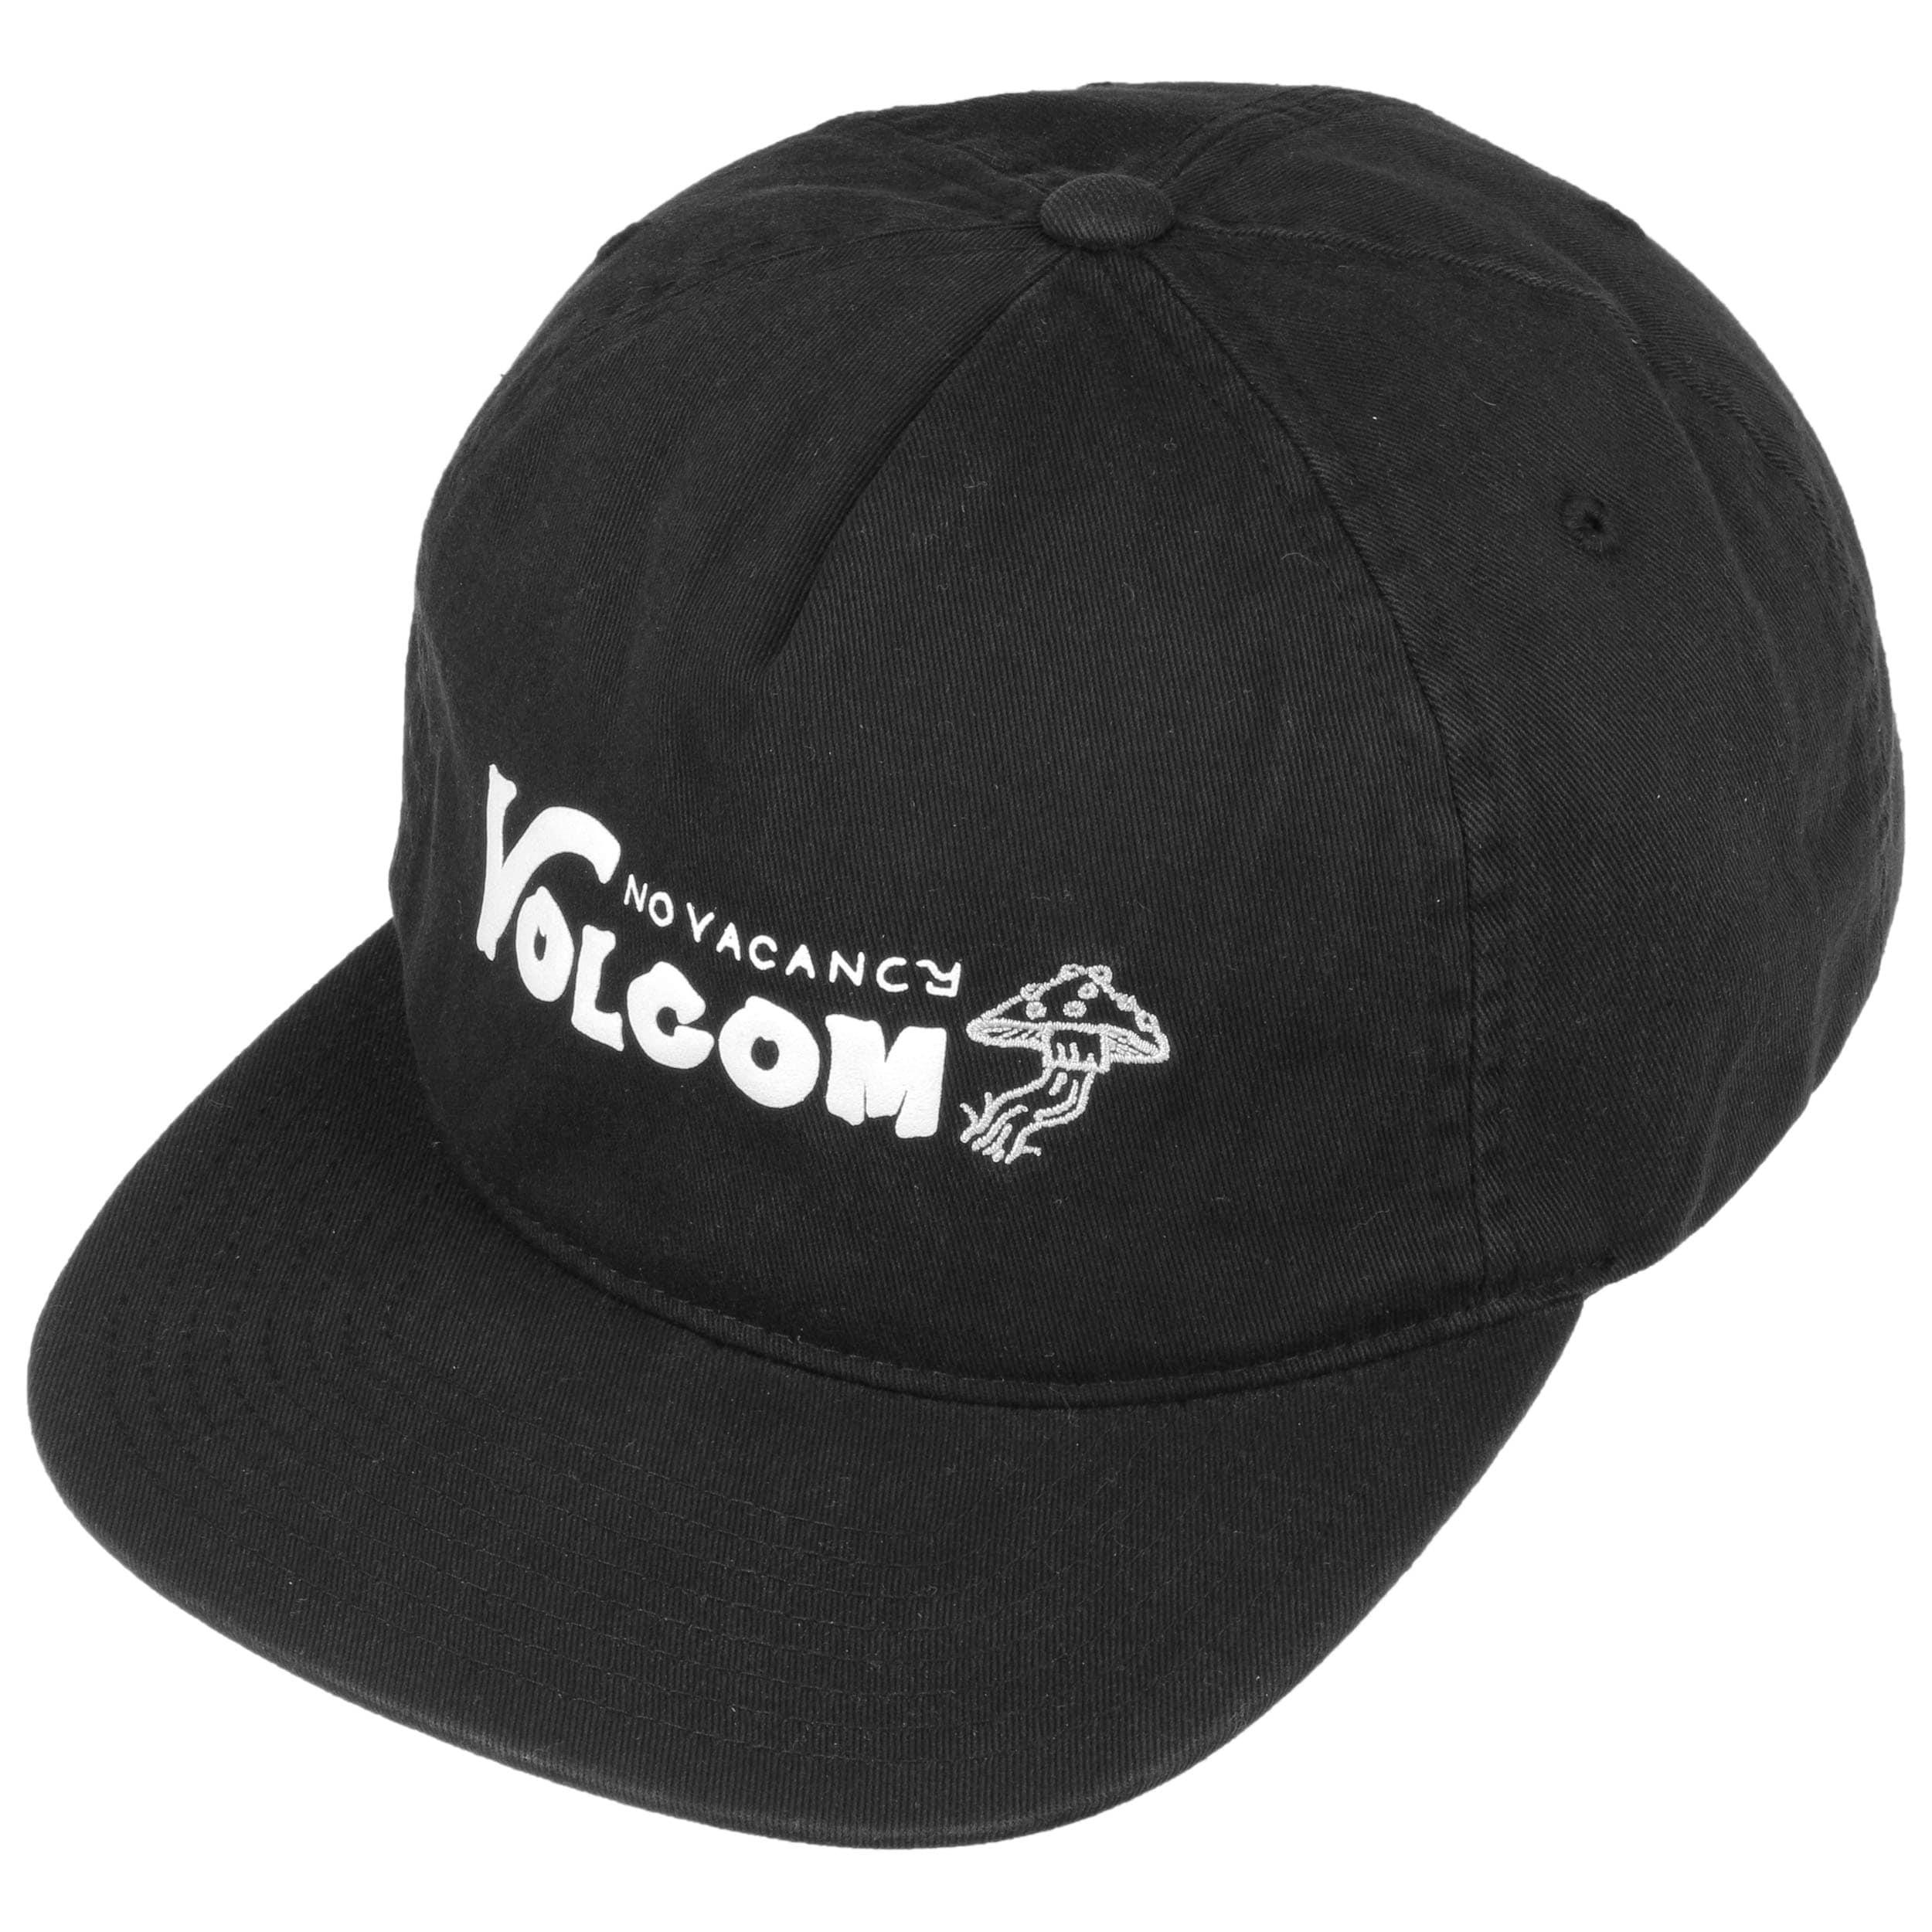 dfb31e1b1277f ... inexpensive no vacancy snapback cap by volcom black 1 5087b 670c9